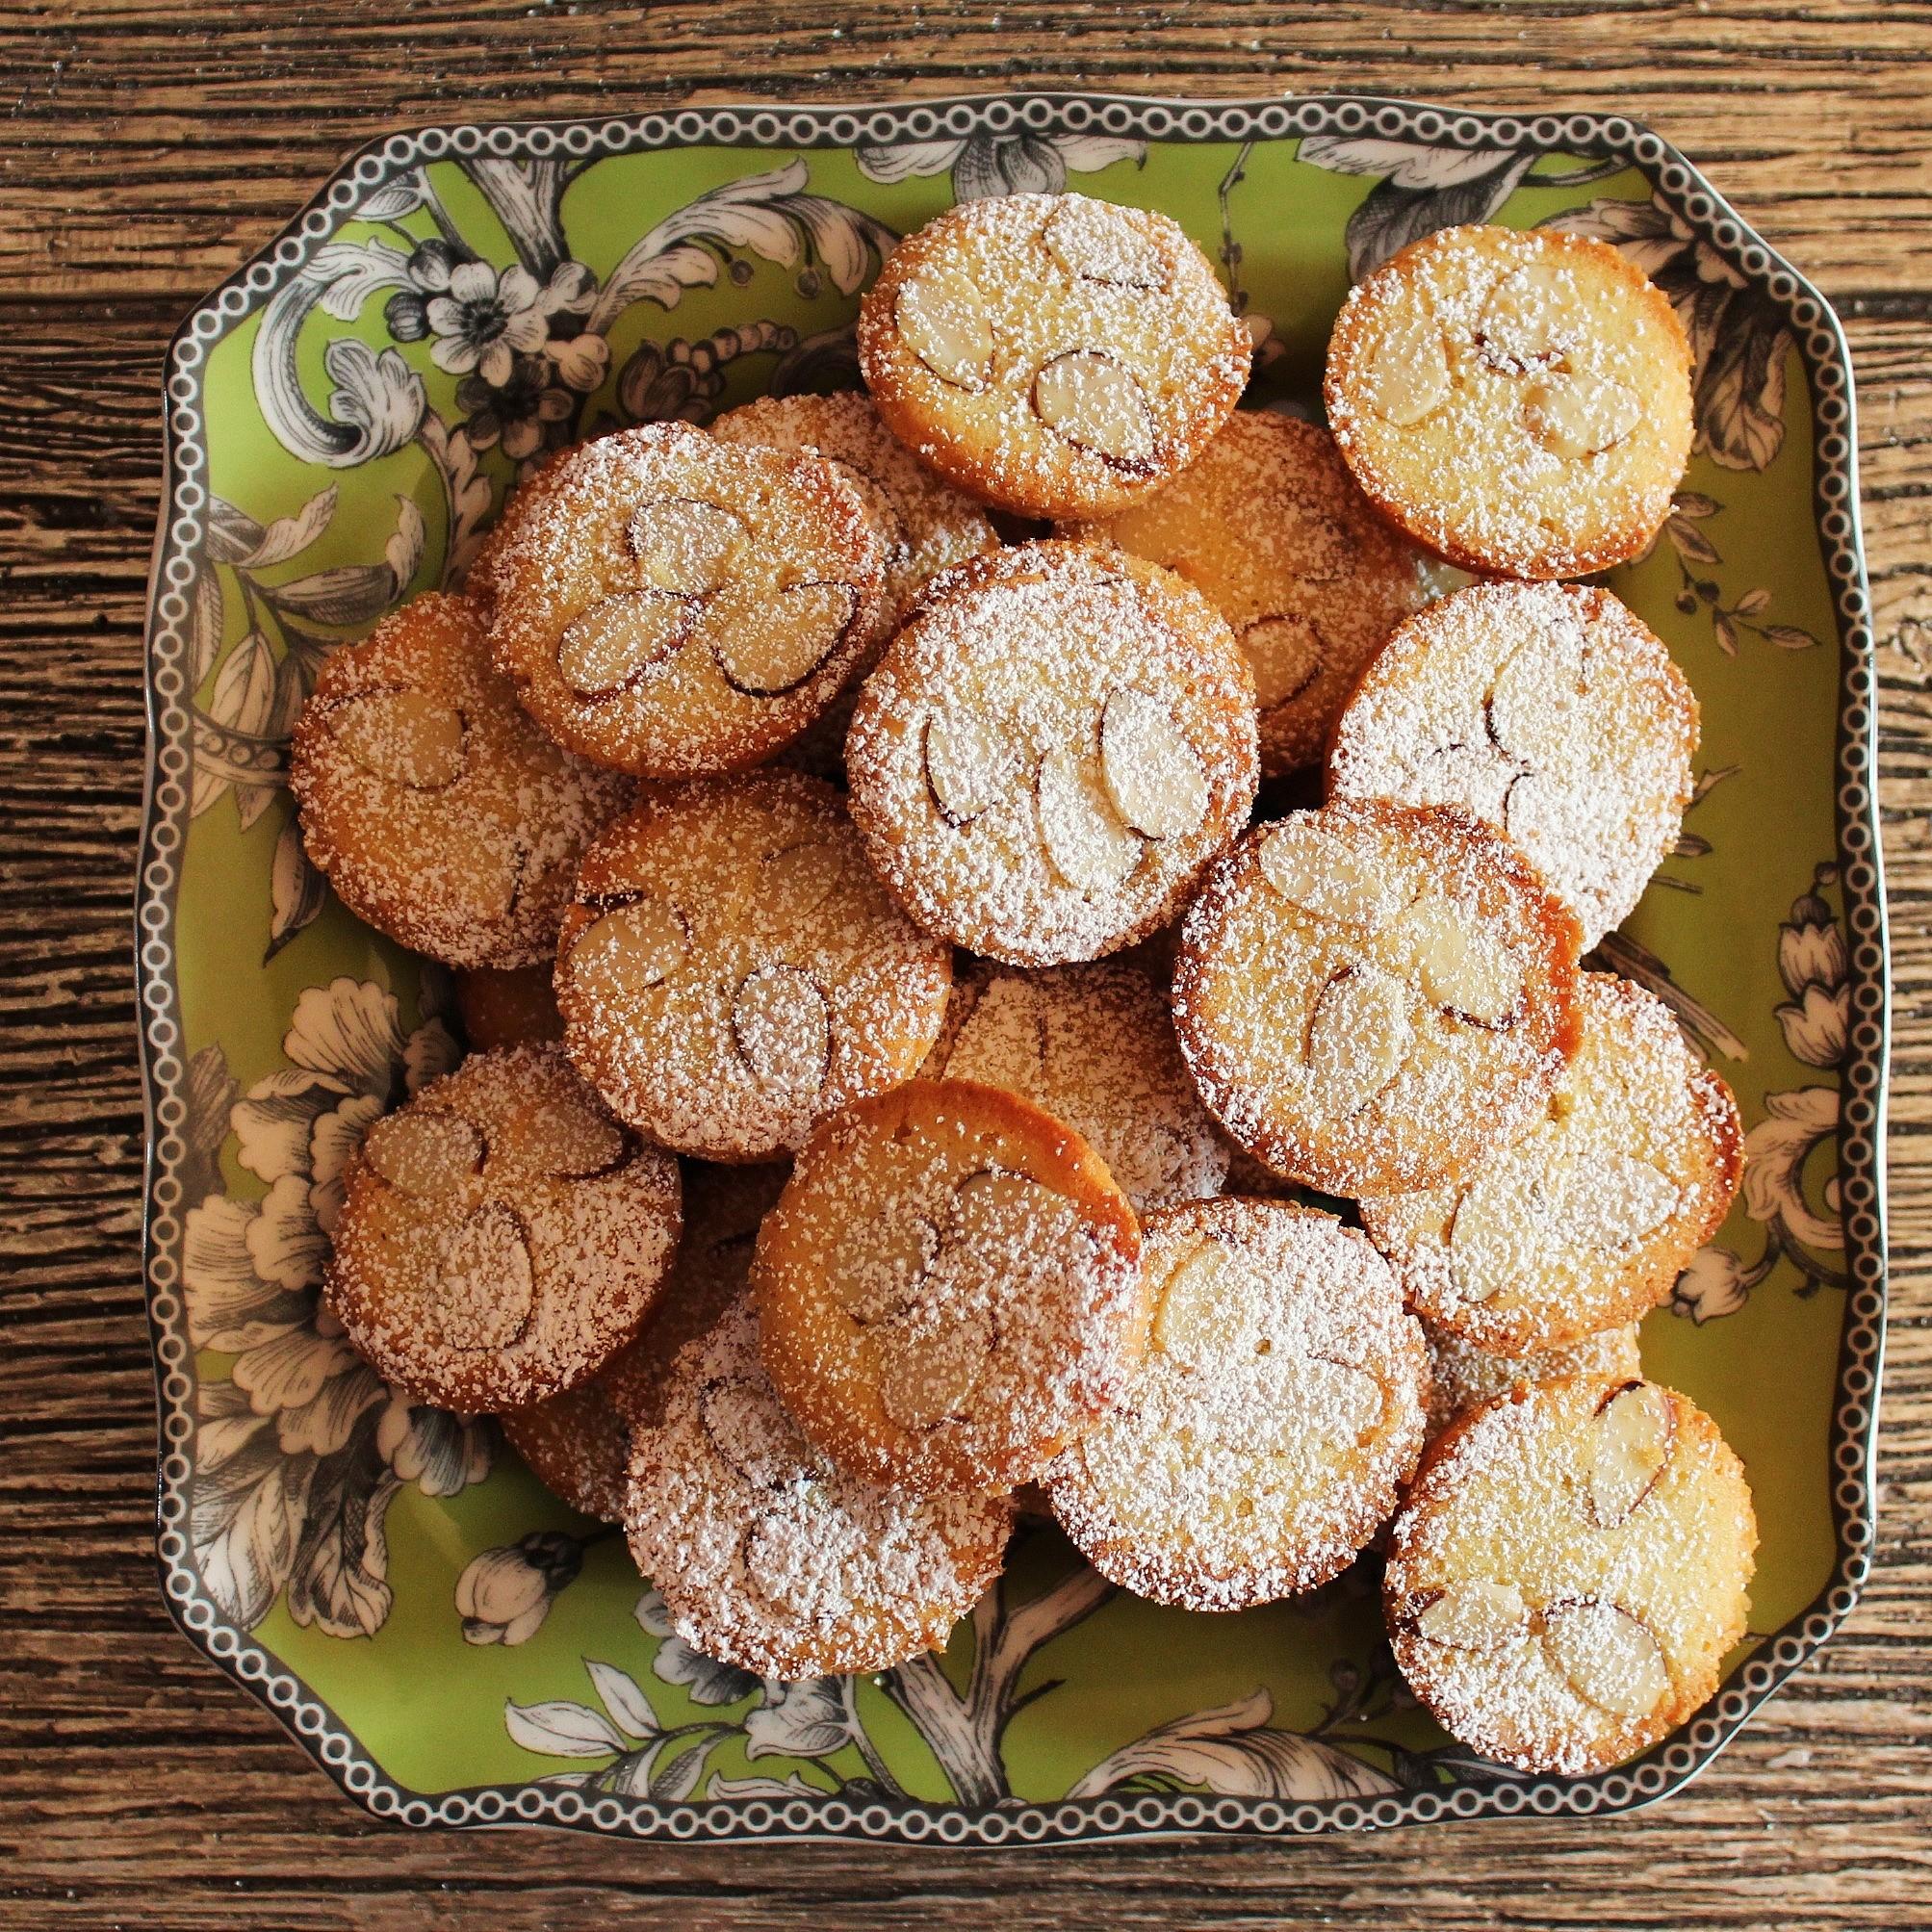 A plate of mini gateaux bretons